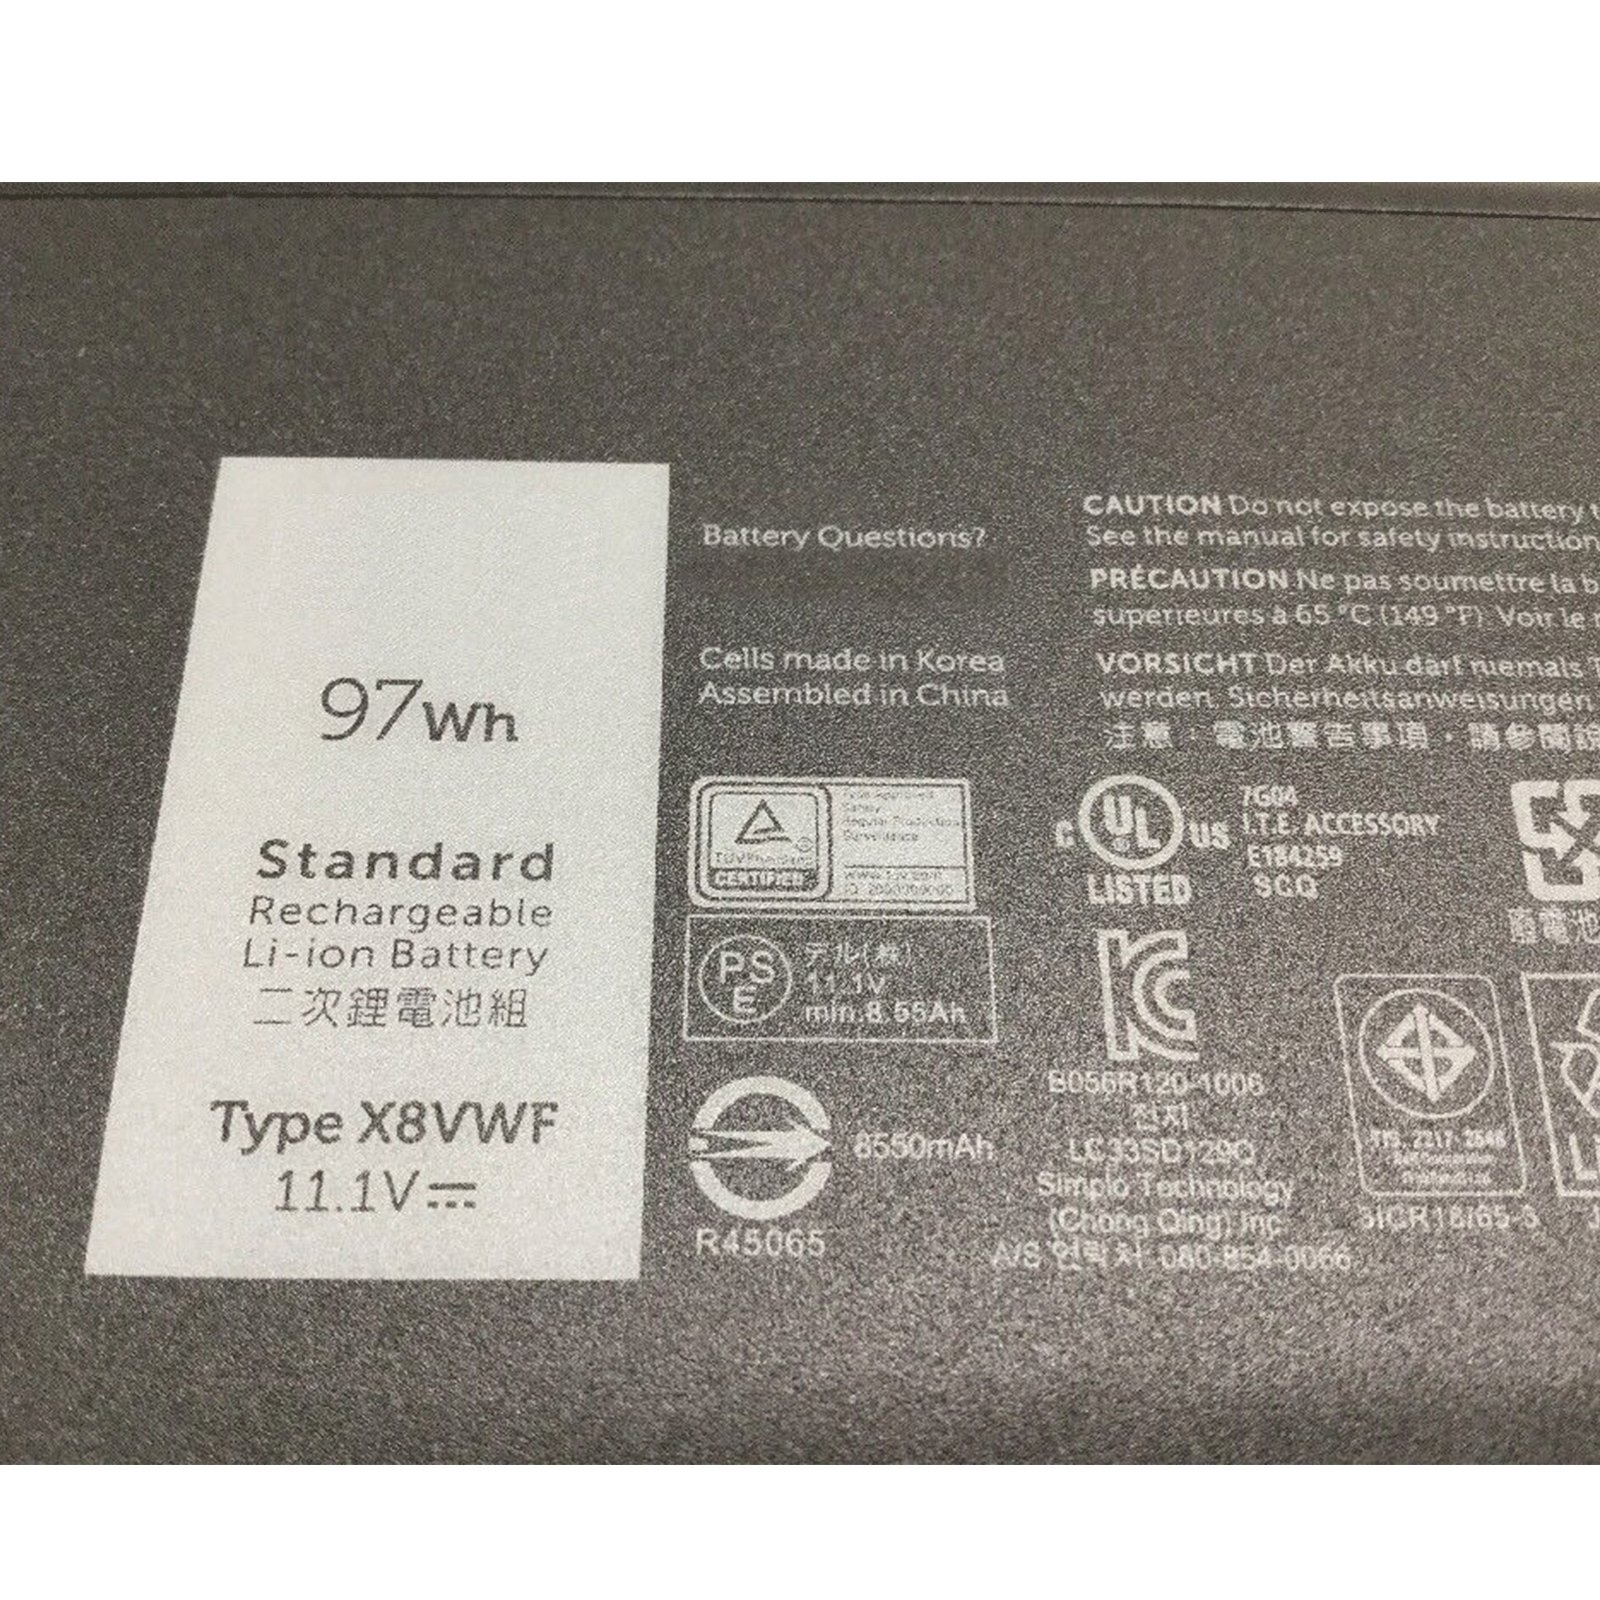 Dentsing 97Wh X8VWF Battery for Dell Latitude 14 E5404 E7404 VCWGN YGV51 453-BBBE Series by Dentsing (Image #2)